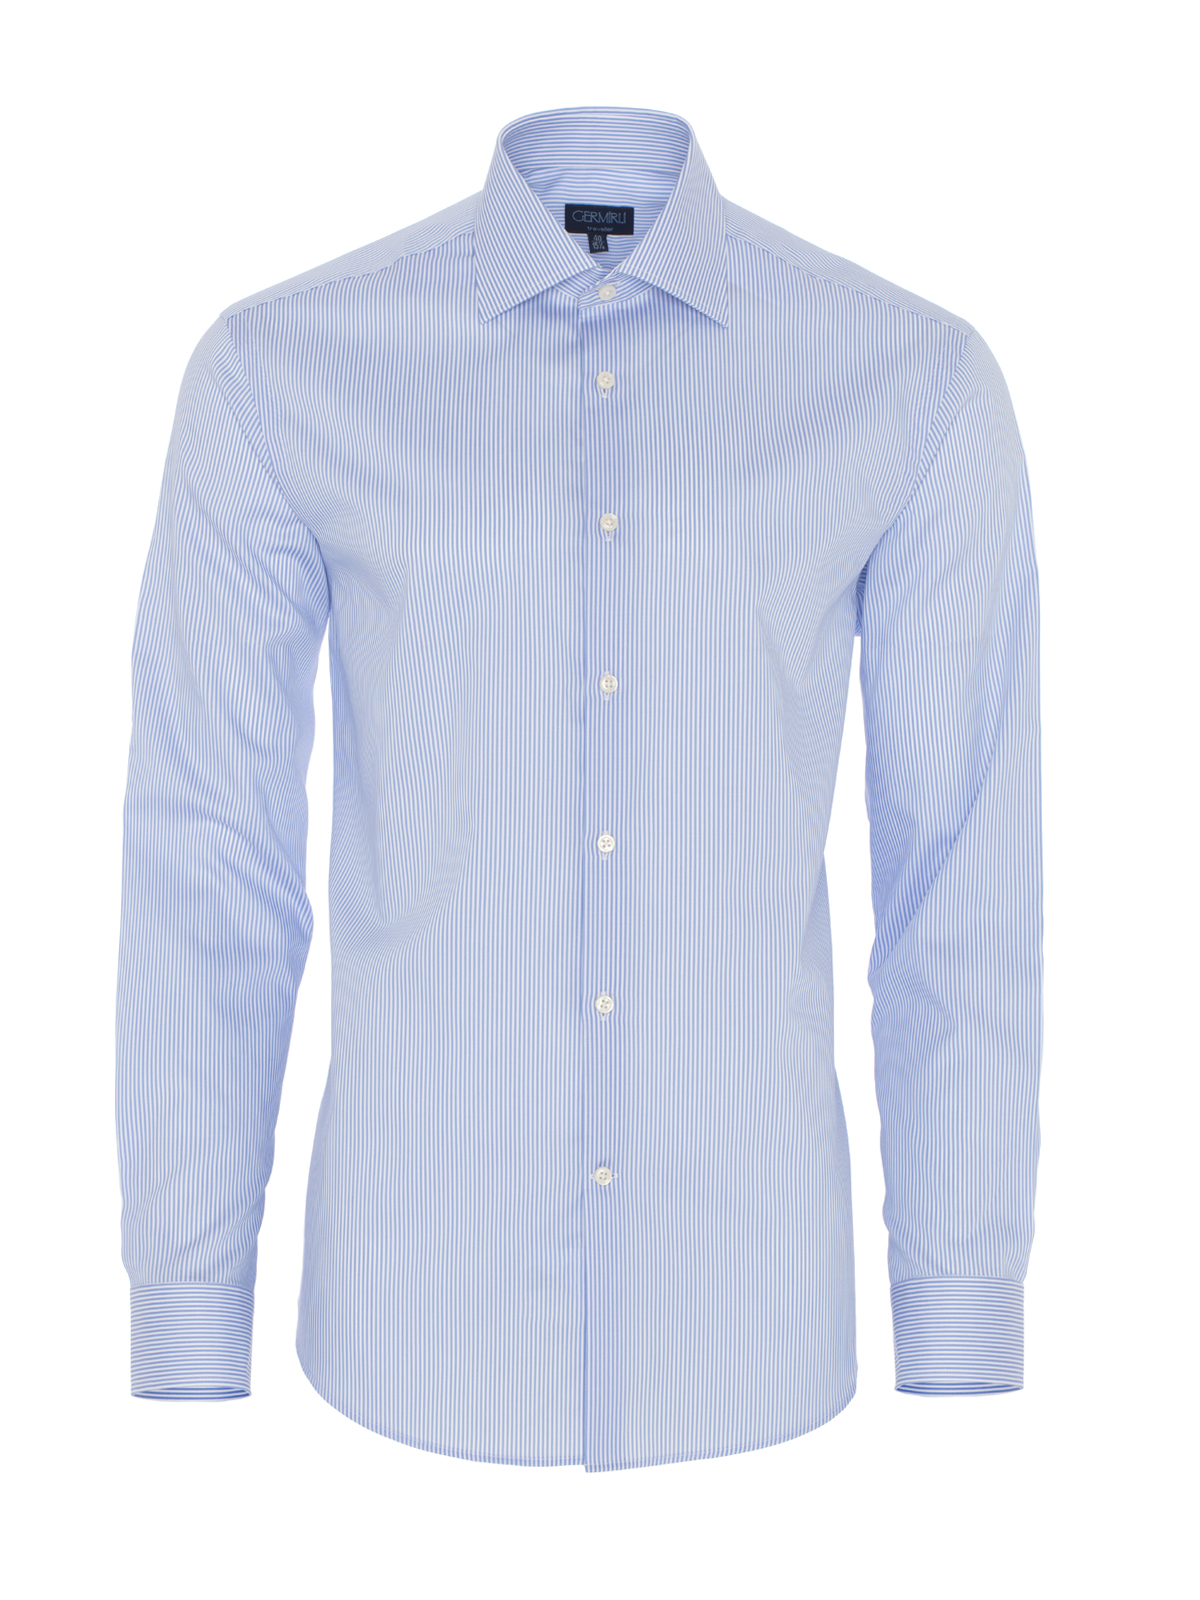 Germirli Non Iron A.Mavi Çizgili Tailor Fit Gömlek